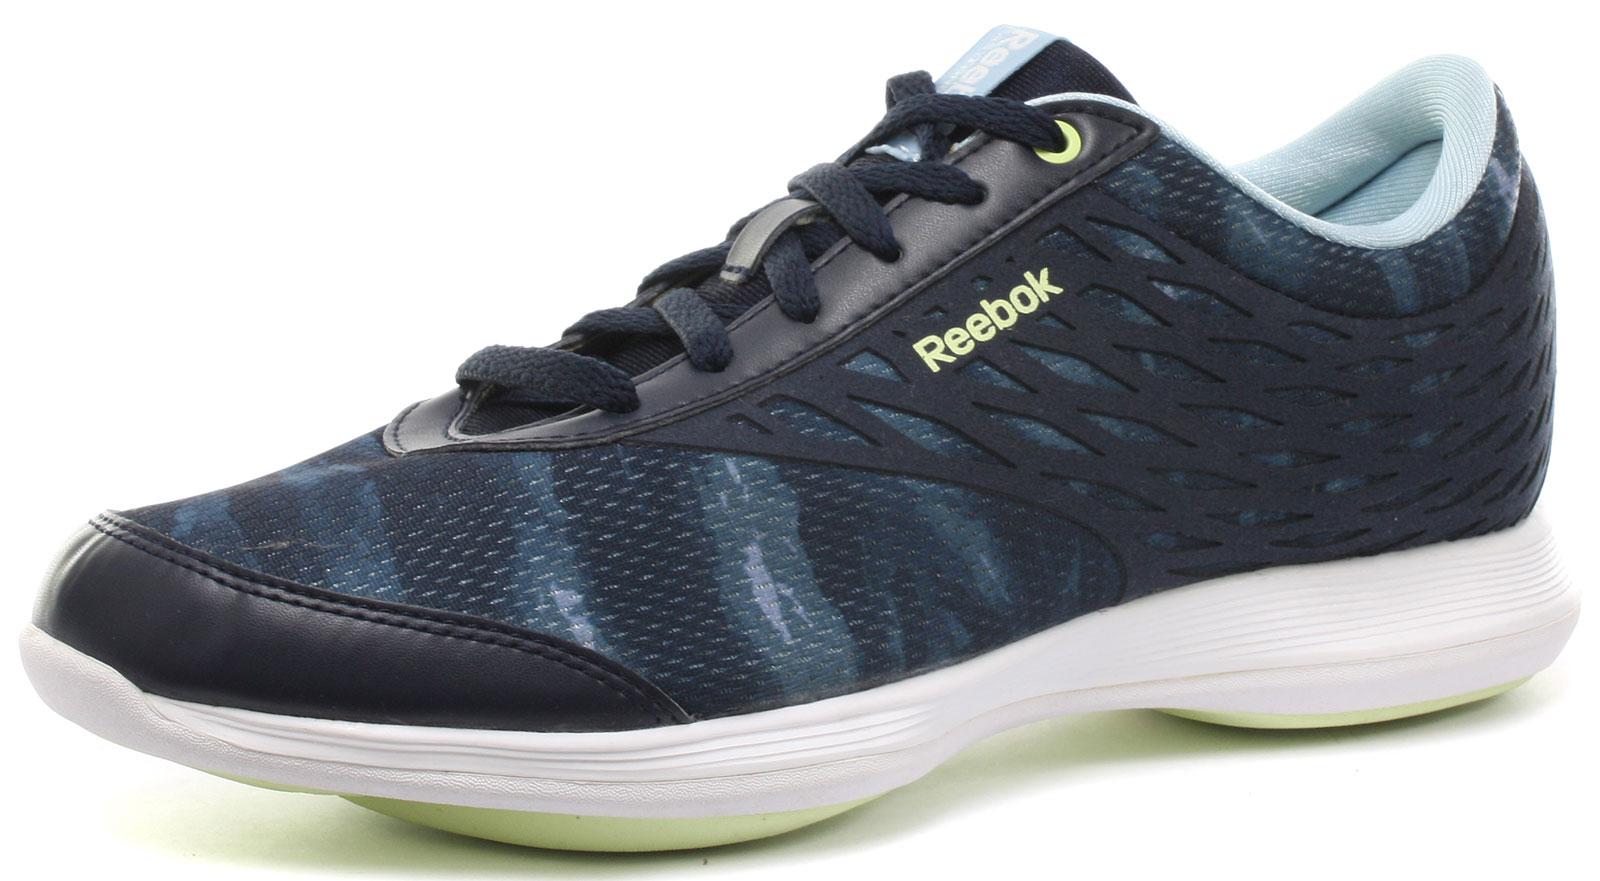 Acquista scarpe da ginnastica reebok easytone - OFF57% sconti 5e50ce979c3